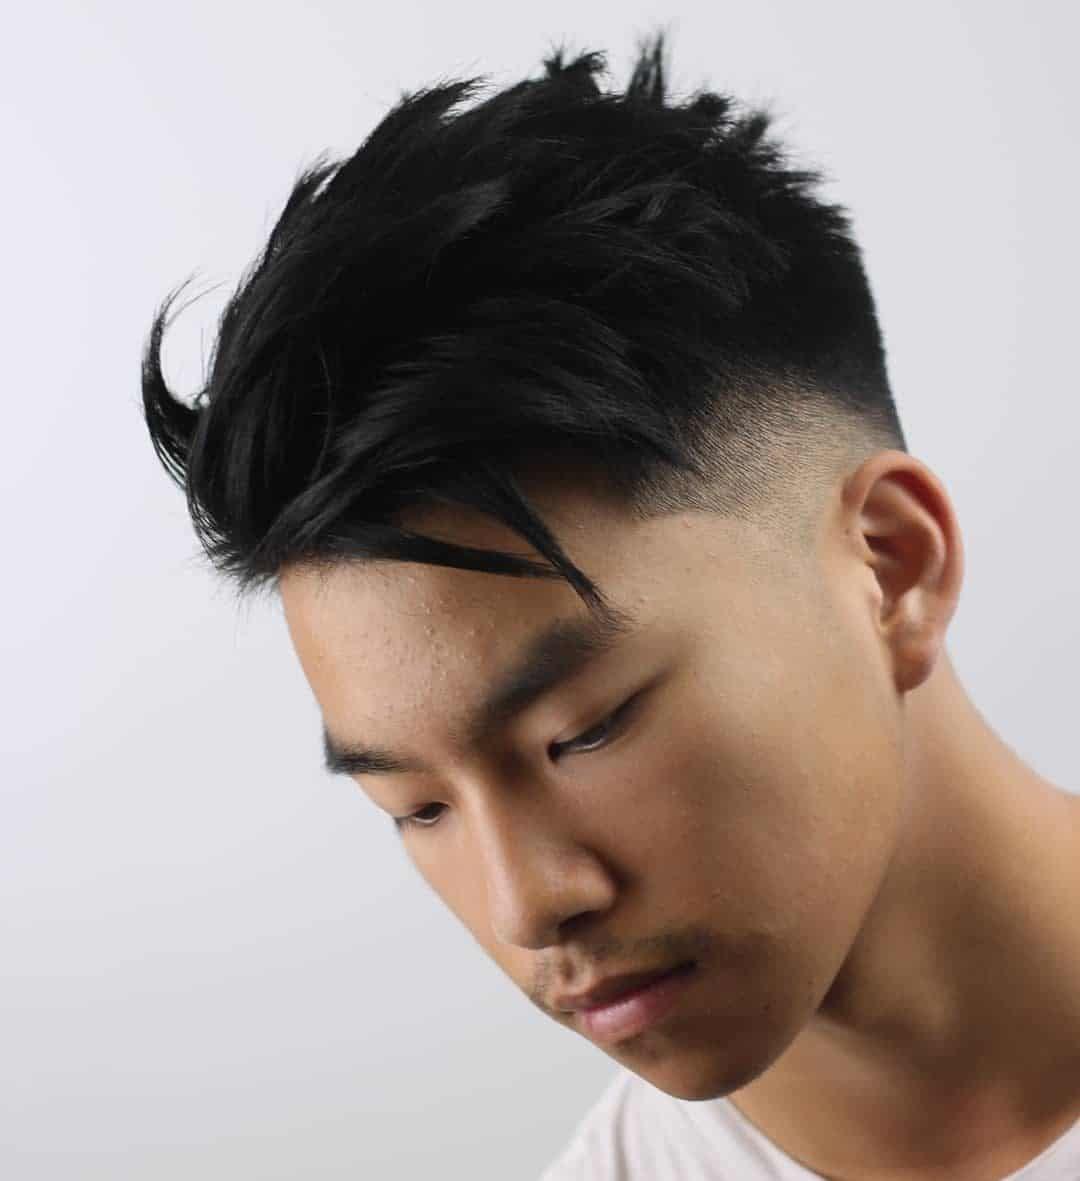 11 Best Hairstyles For Asian Men (11 Styles)  Asian men